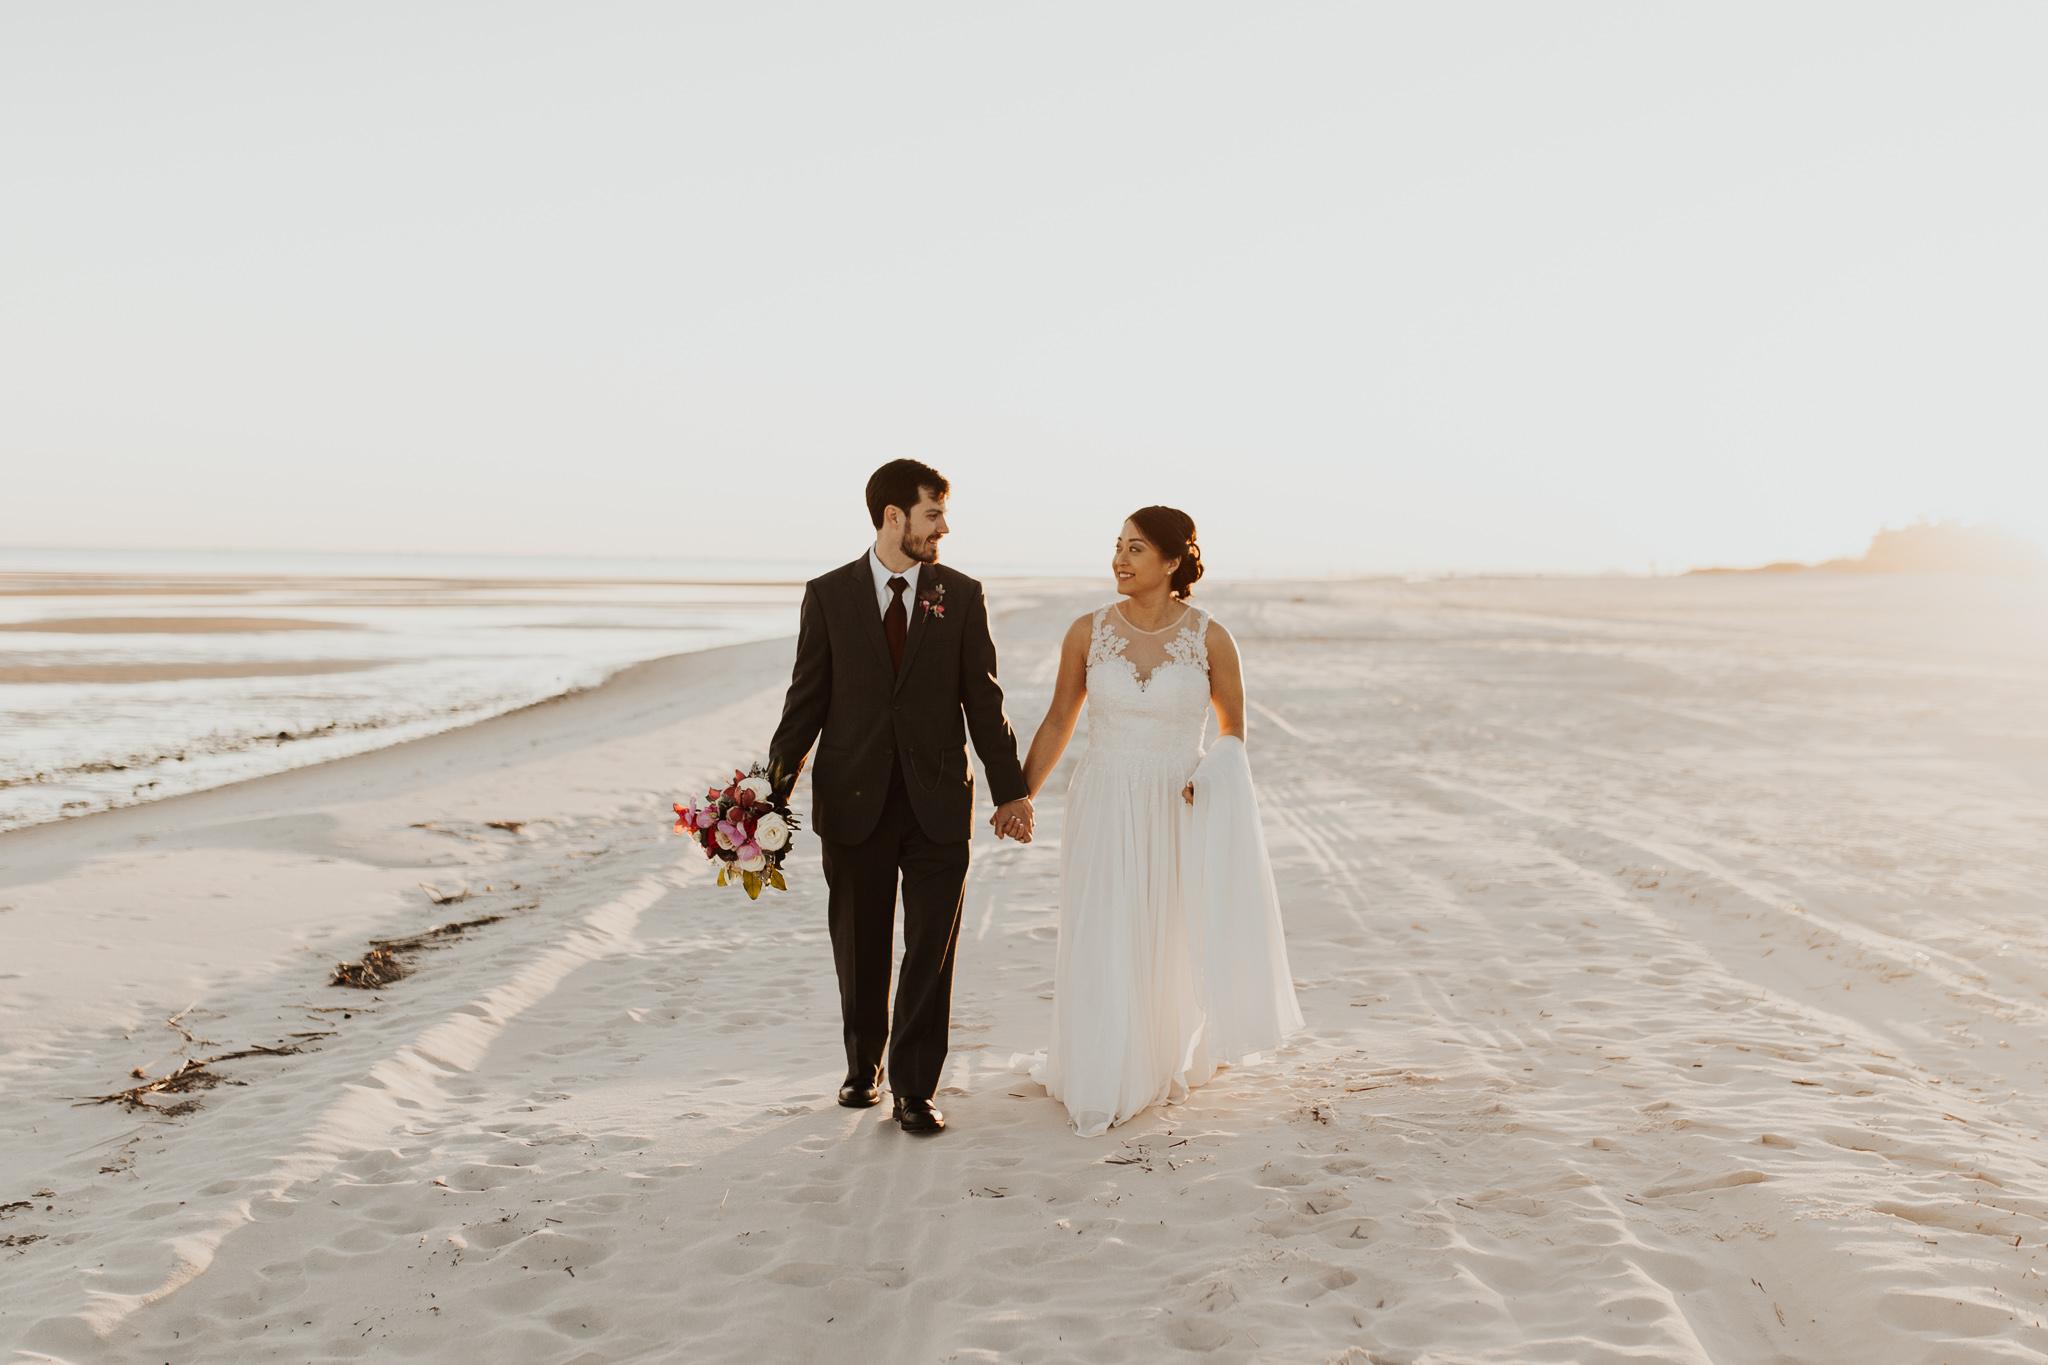 memphis-wedding-photographer-nashville-tn